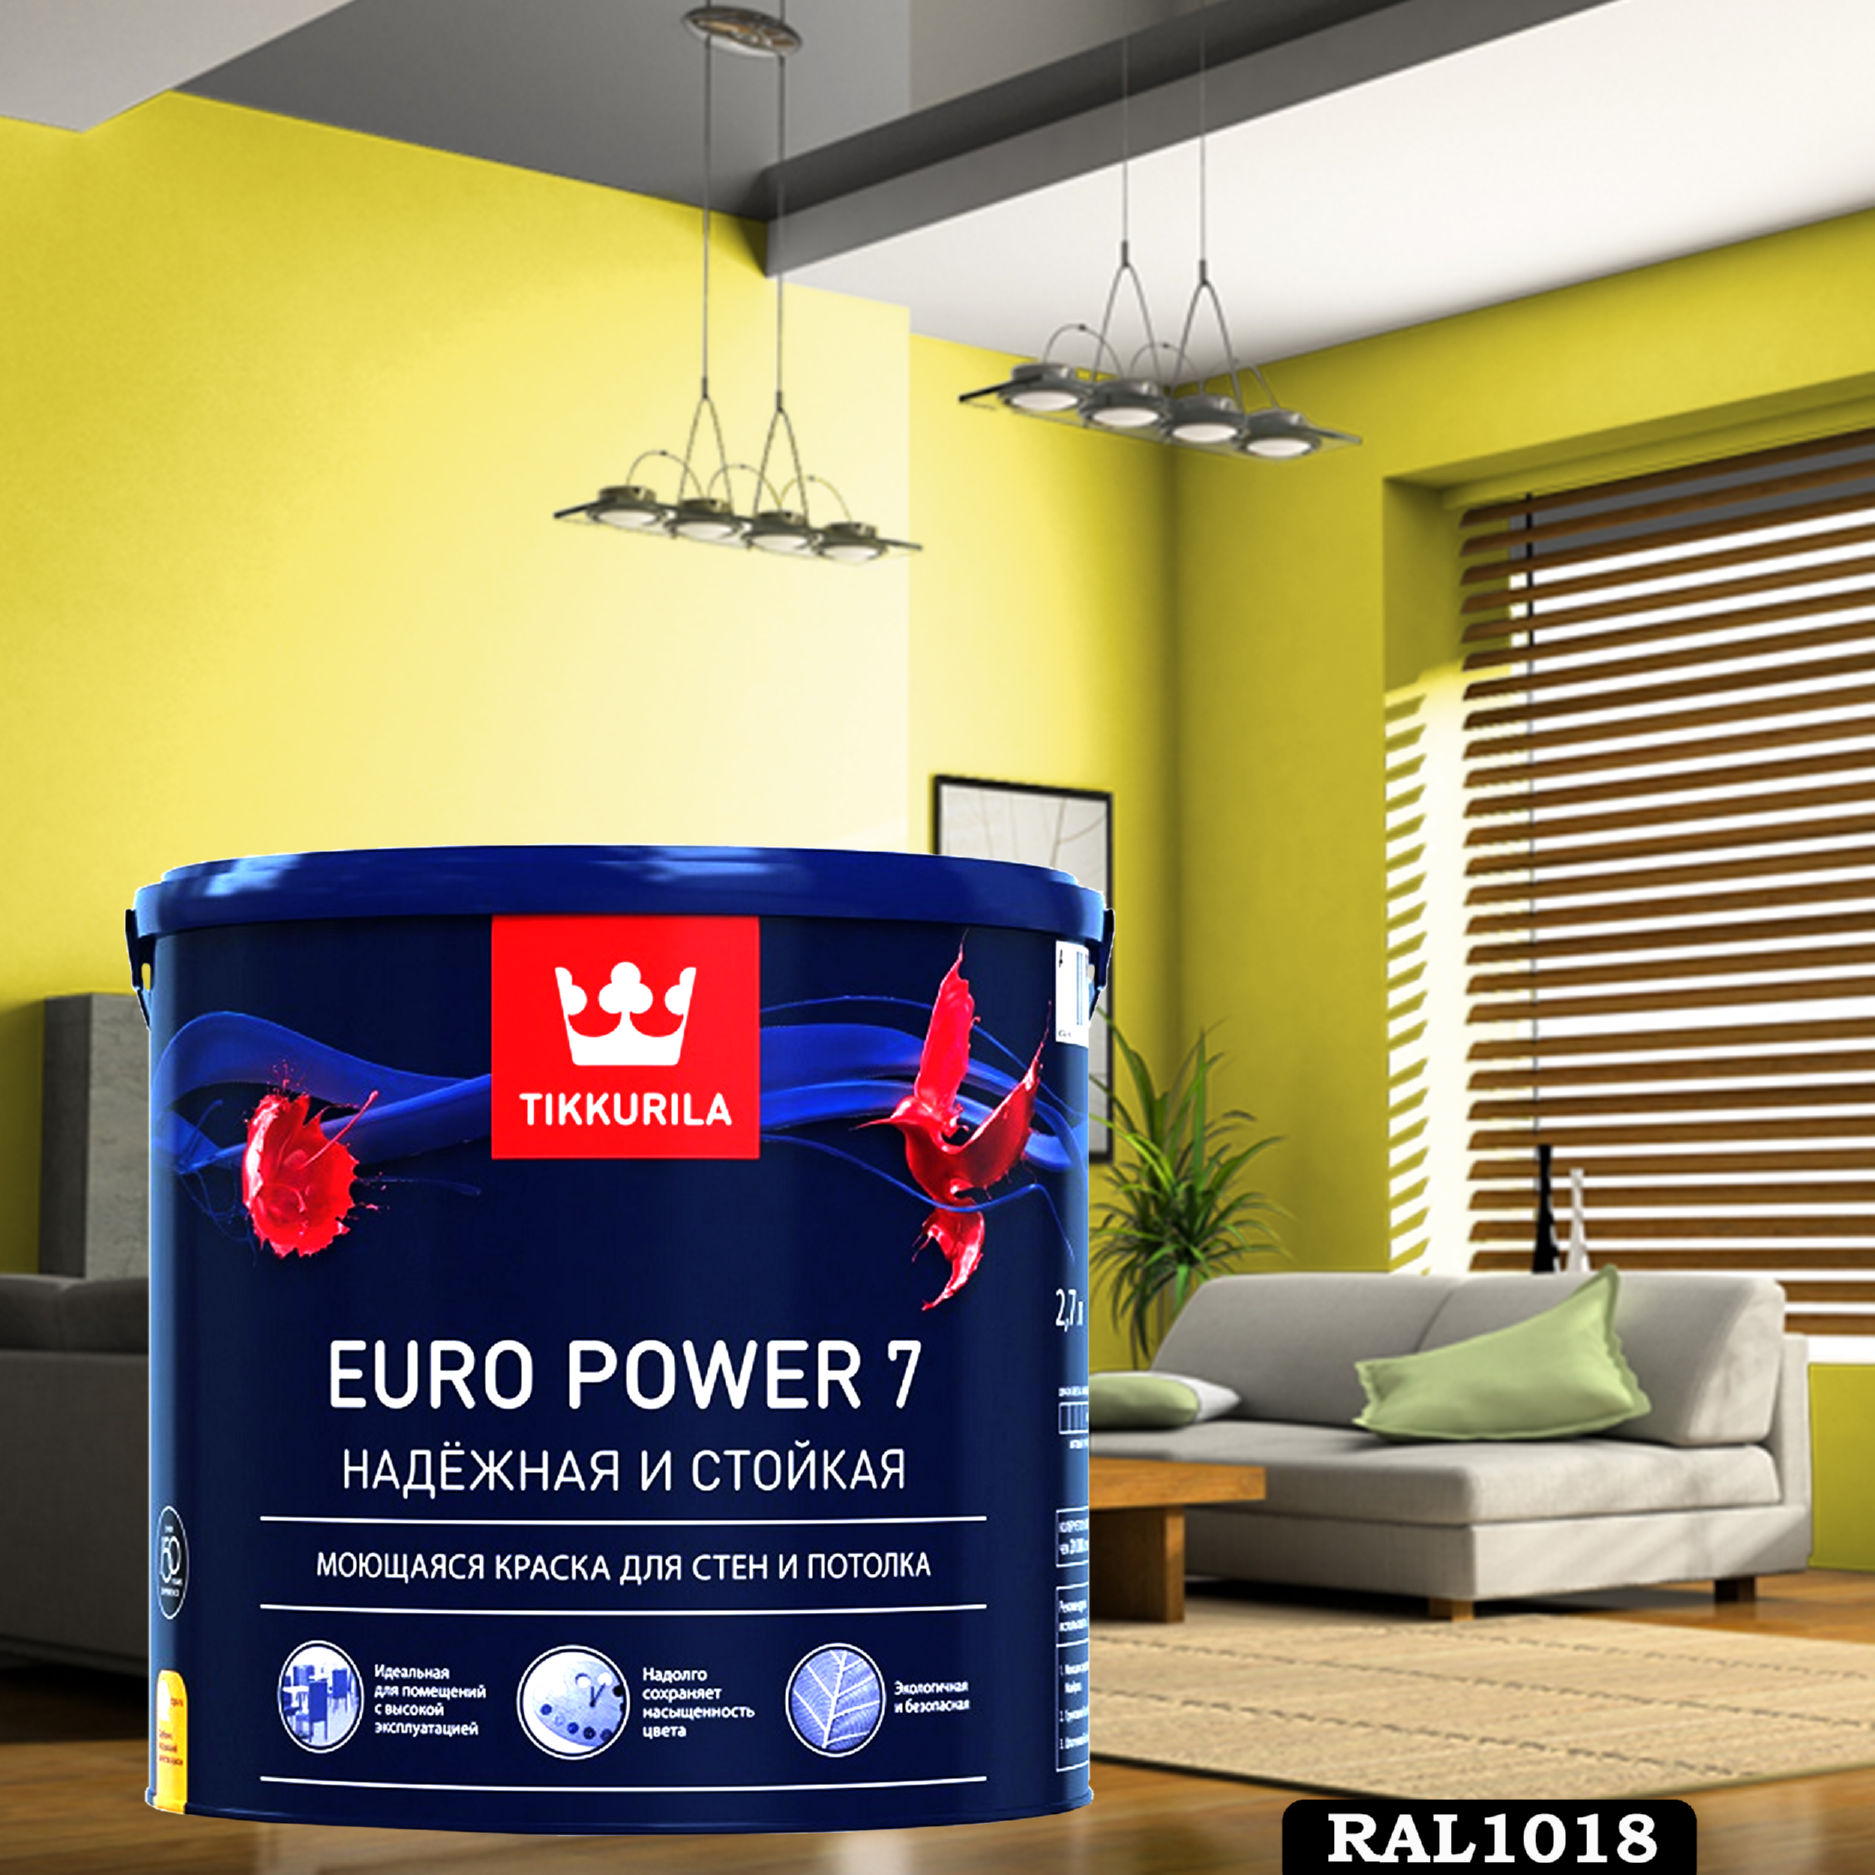 Фото 16 - Краска TIKKURILA Euro Power 7,  RAL 1018 Цинково-жёлтый, латексная моющаяся матовая интерьерная, 9 л.